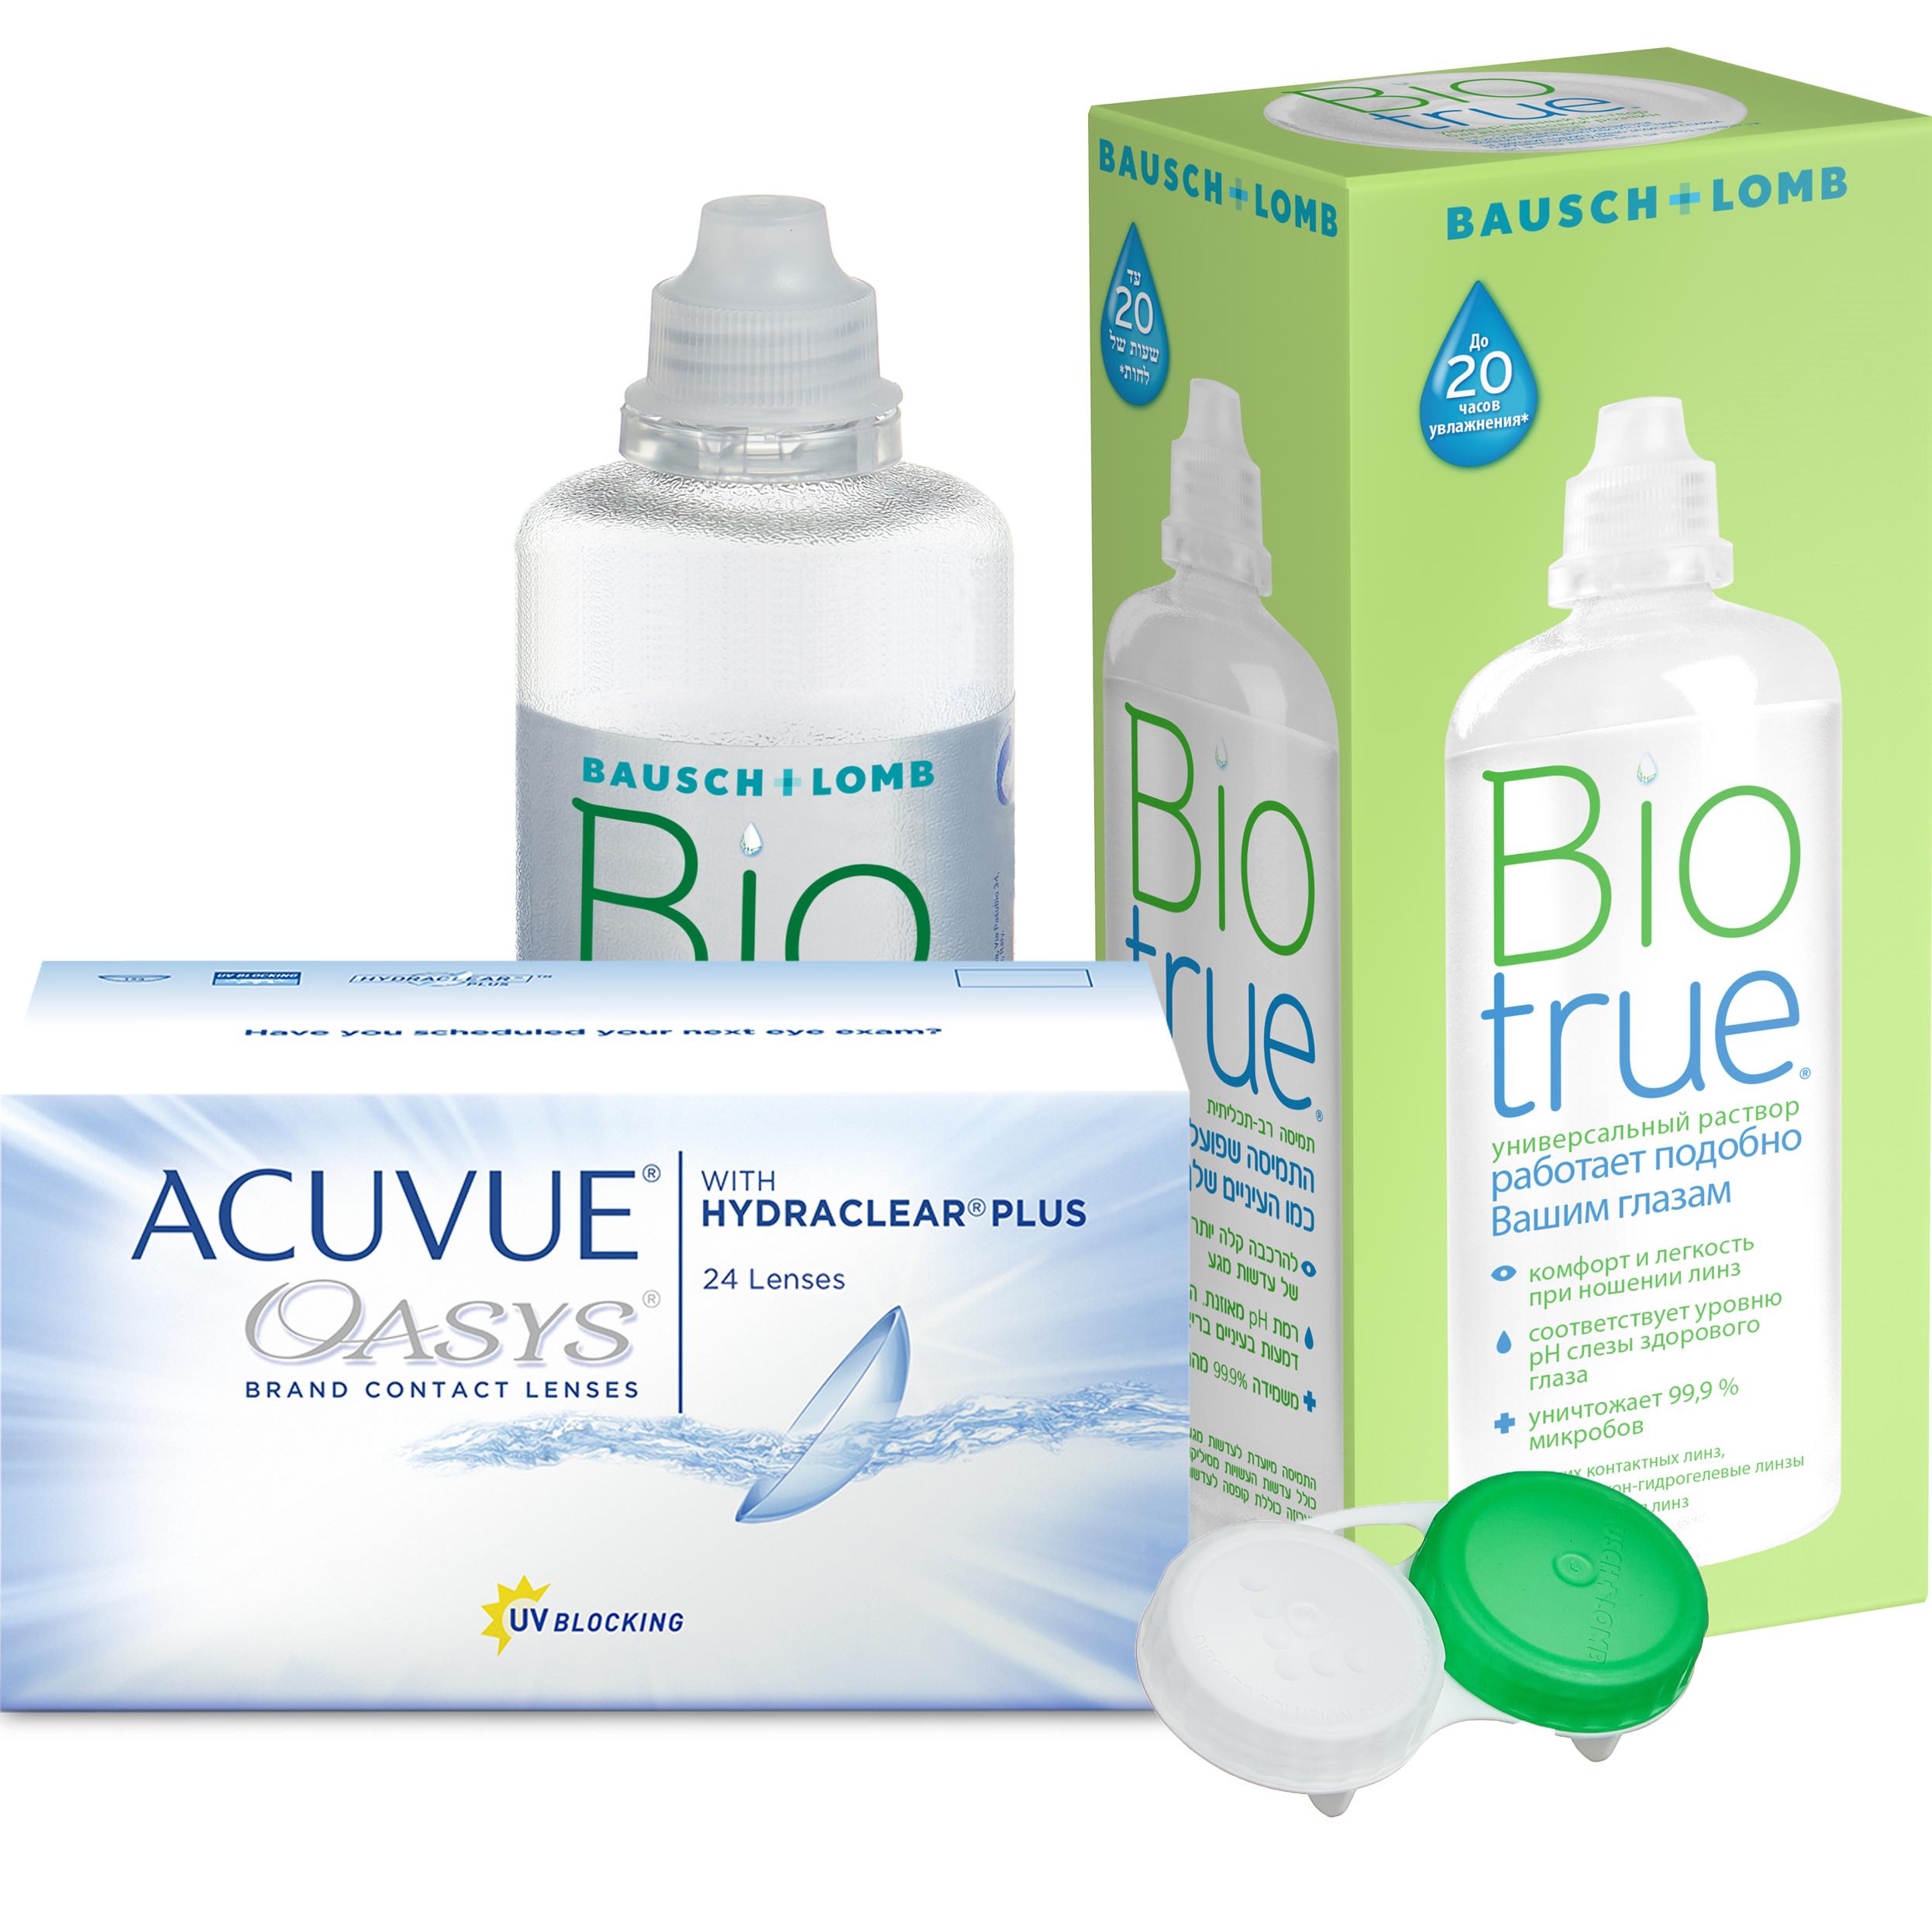 Купить Oasys with Hydraclear Plus 24 линзы + Biotrue, Контактные линзы Acuvue Oasys with Hydraclear Plus 24 линзы R 8.4 +3, 75 + Biotrue 300 мл